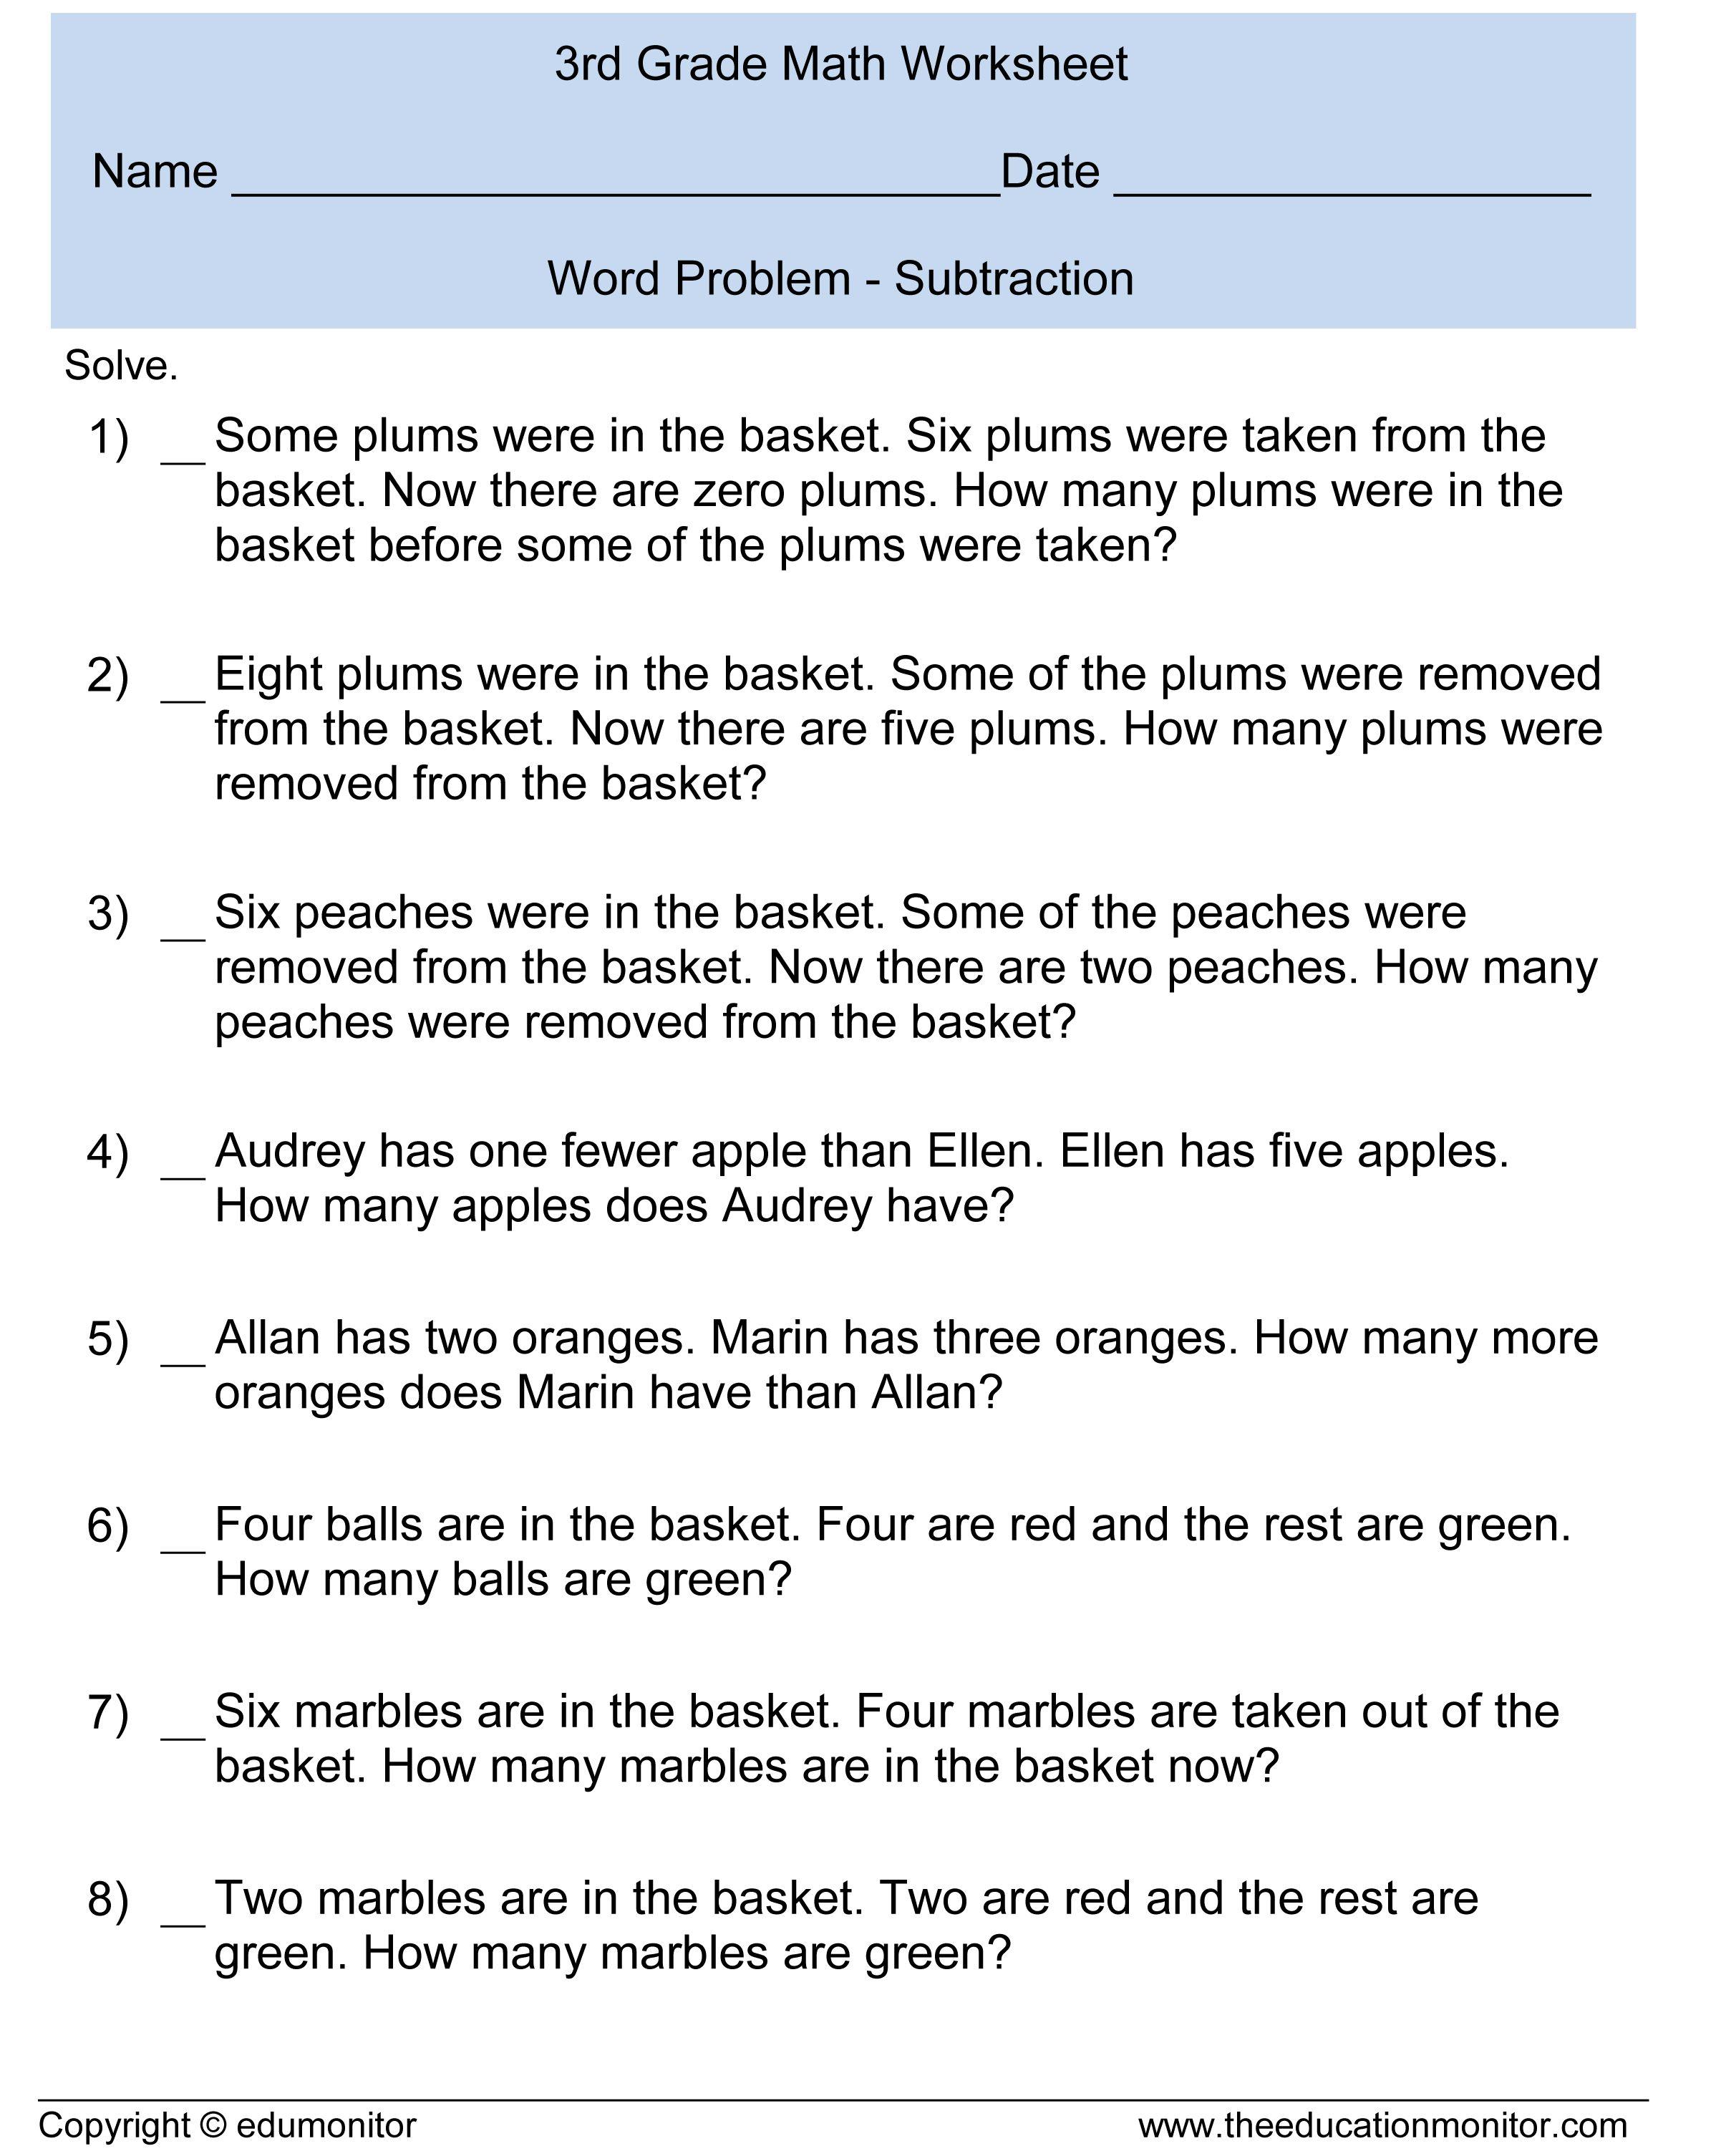 Third Grade Subtraction Word Problems